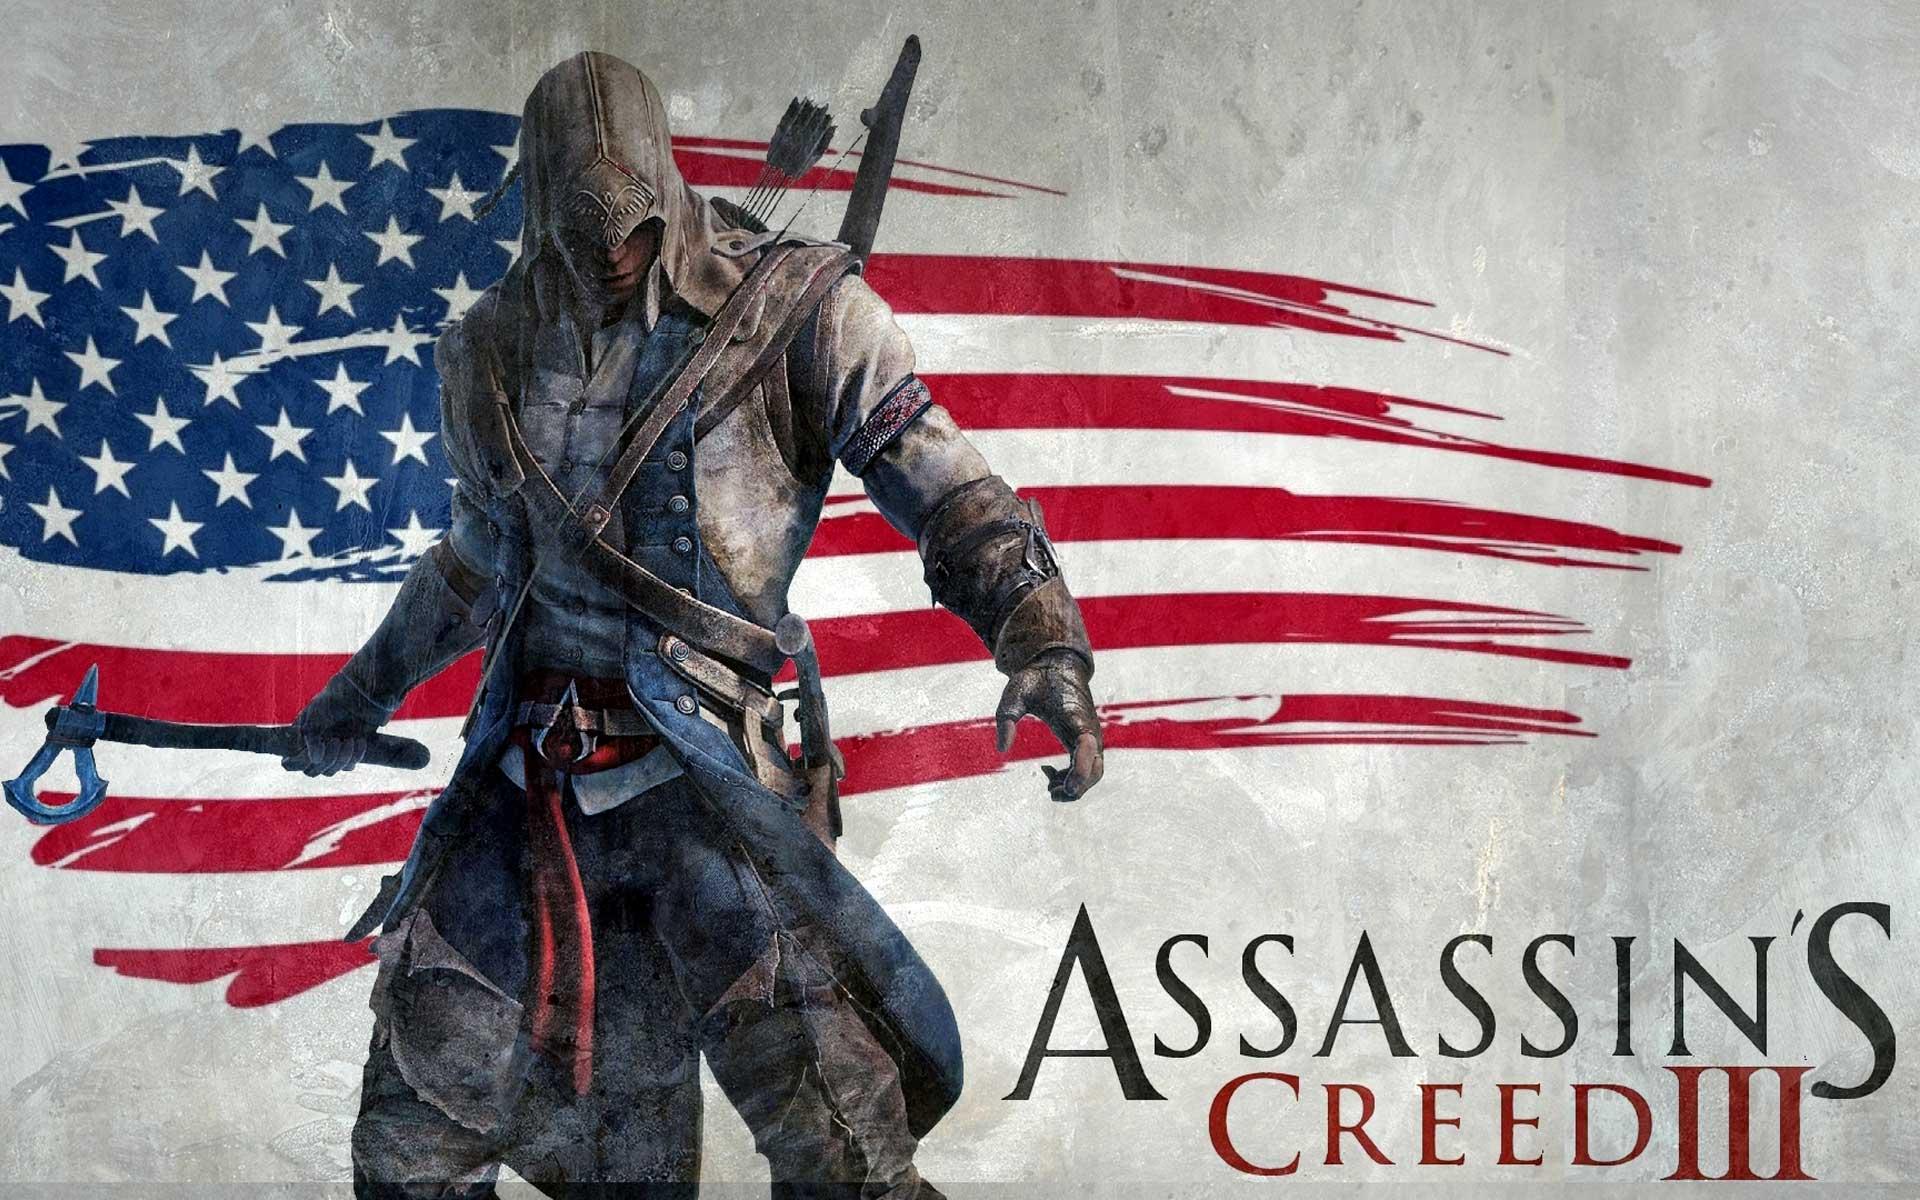 assassins creed 3 1920x1200